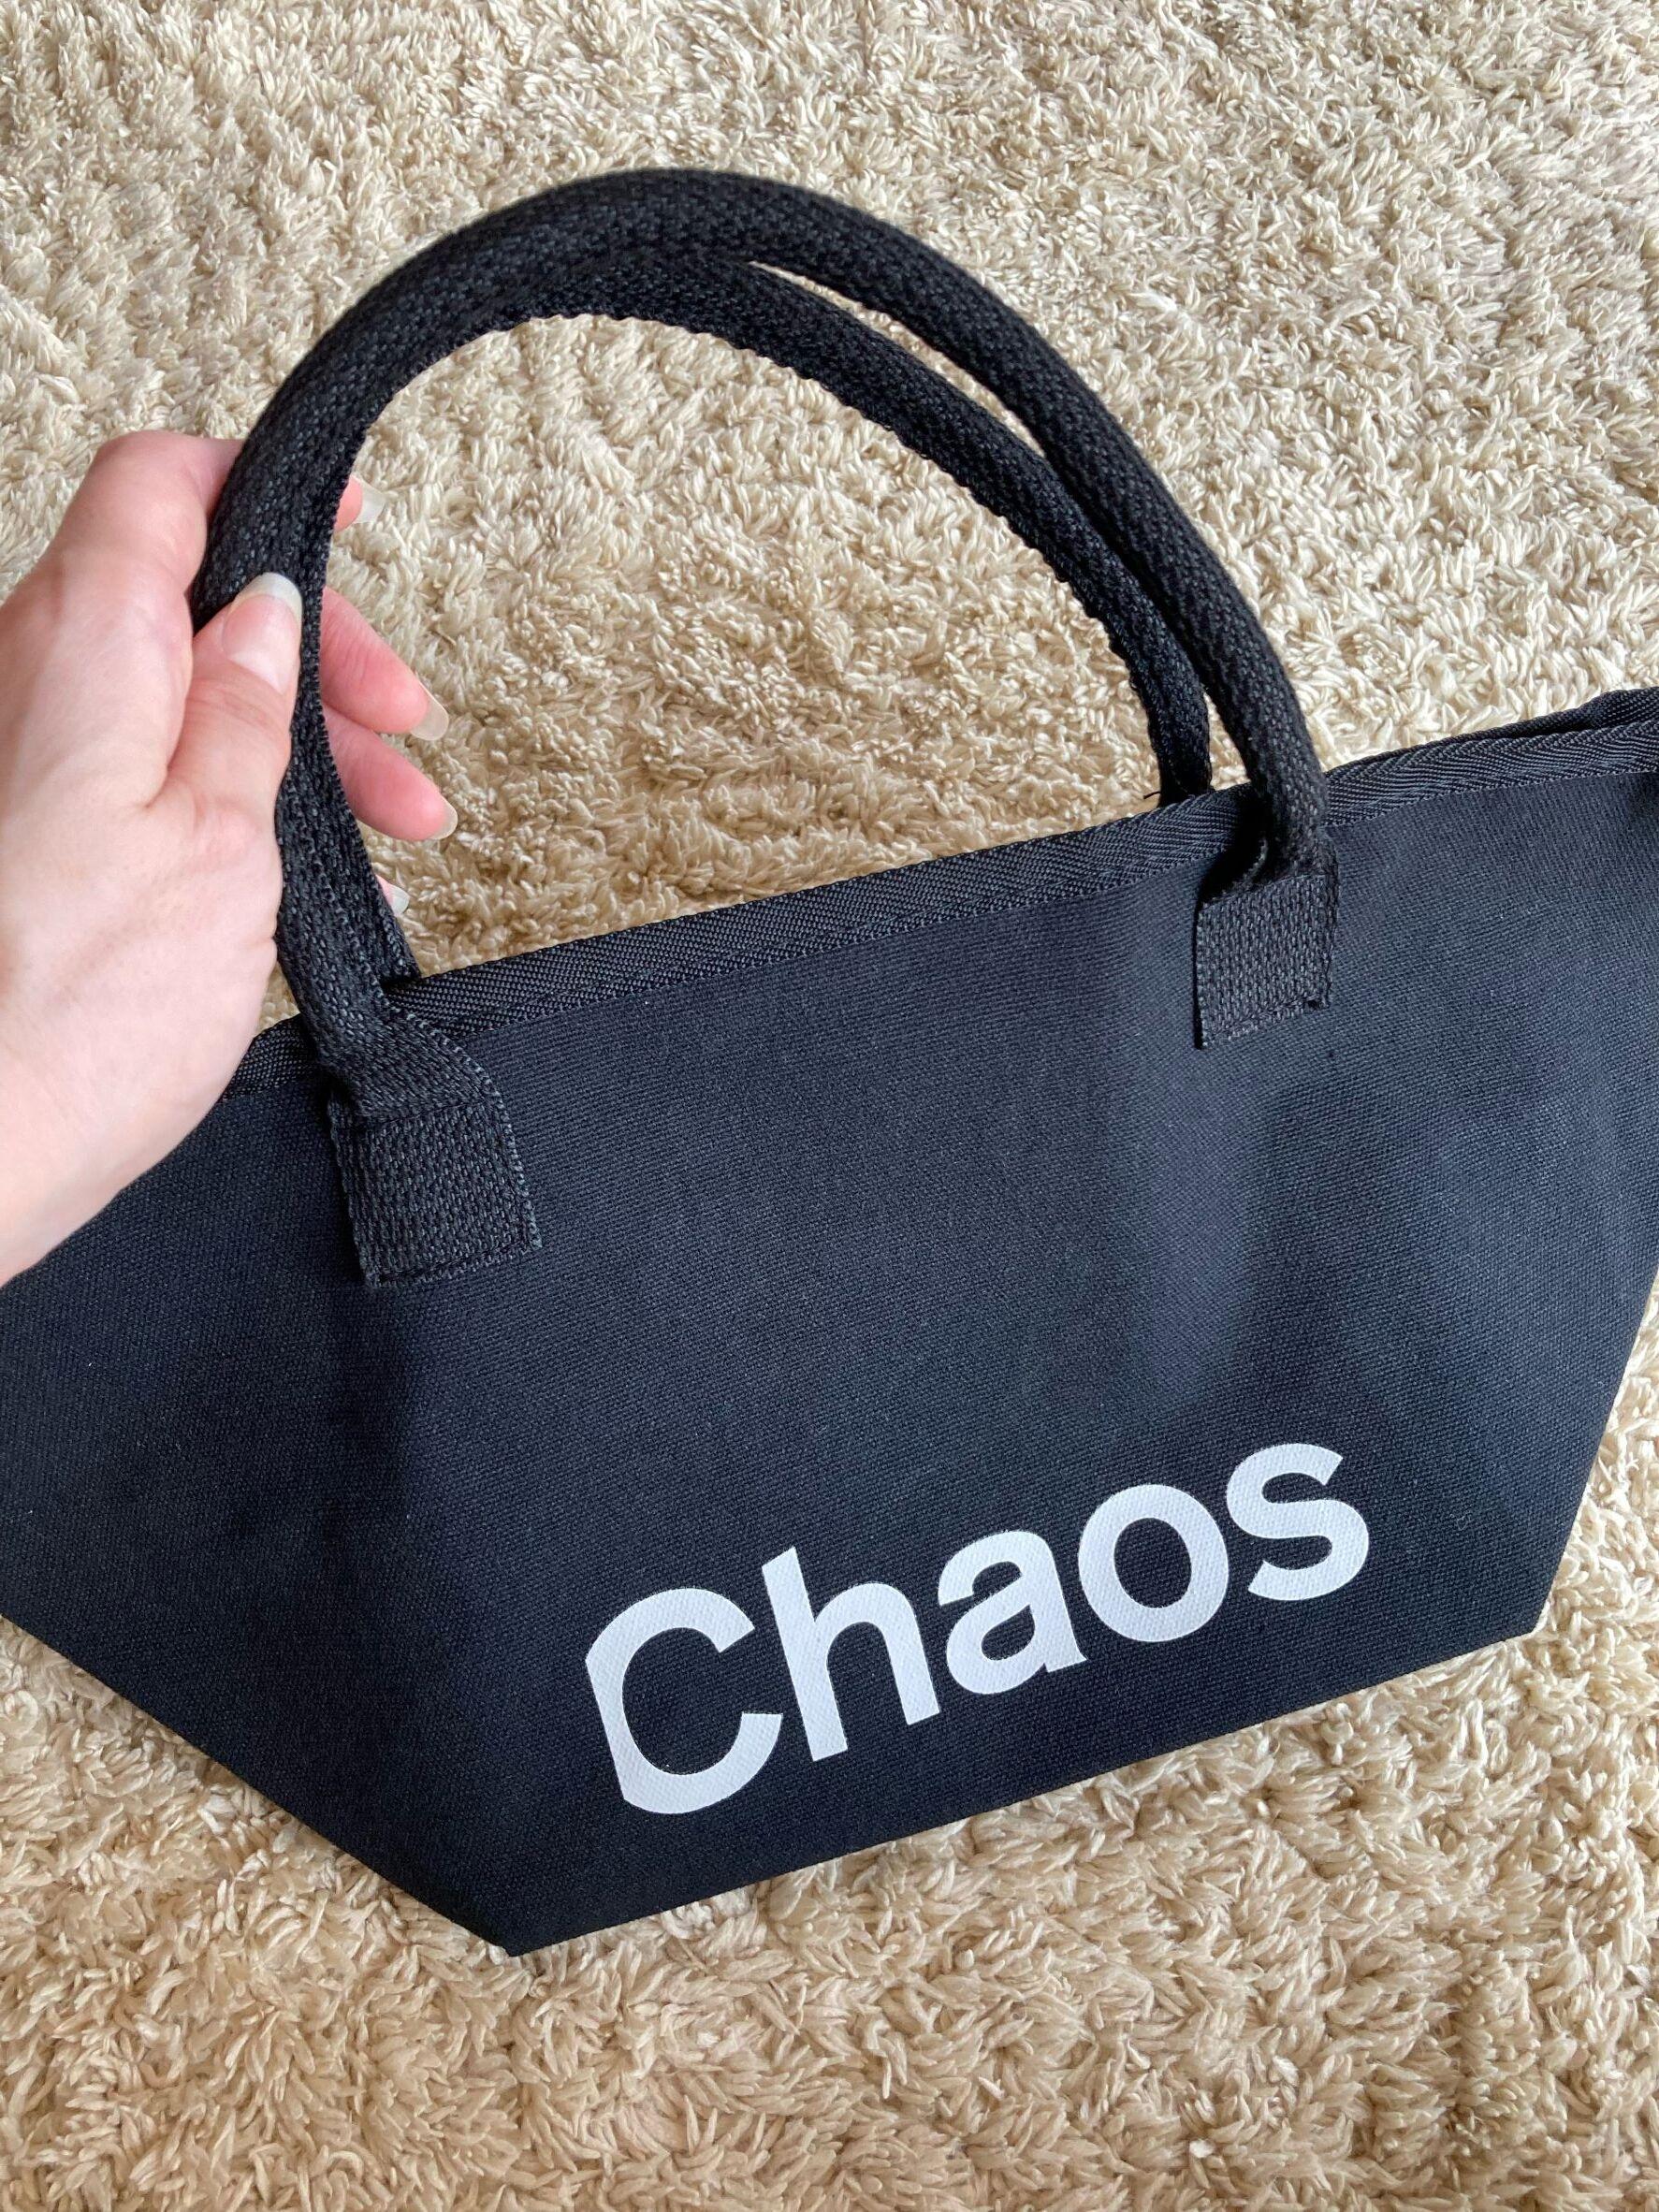 Chaos × eclat 特別付録☆_1_5-1